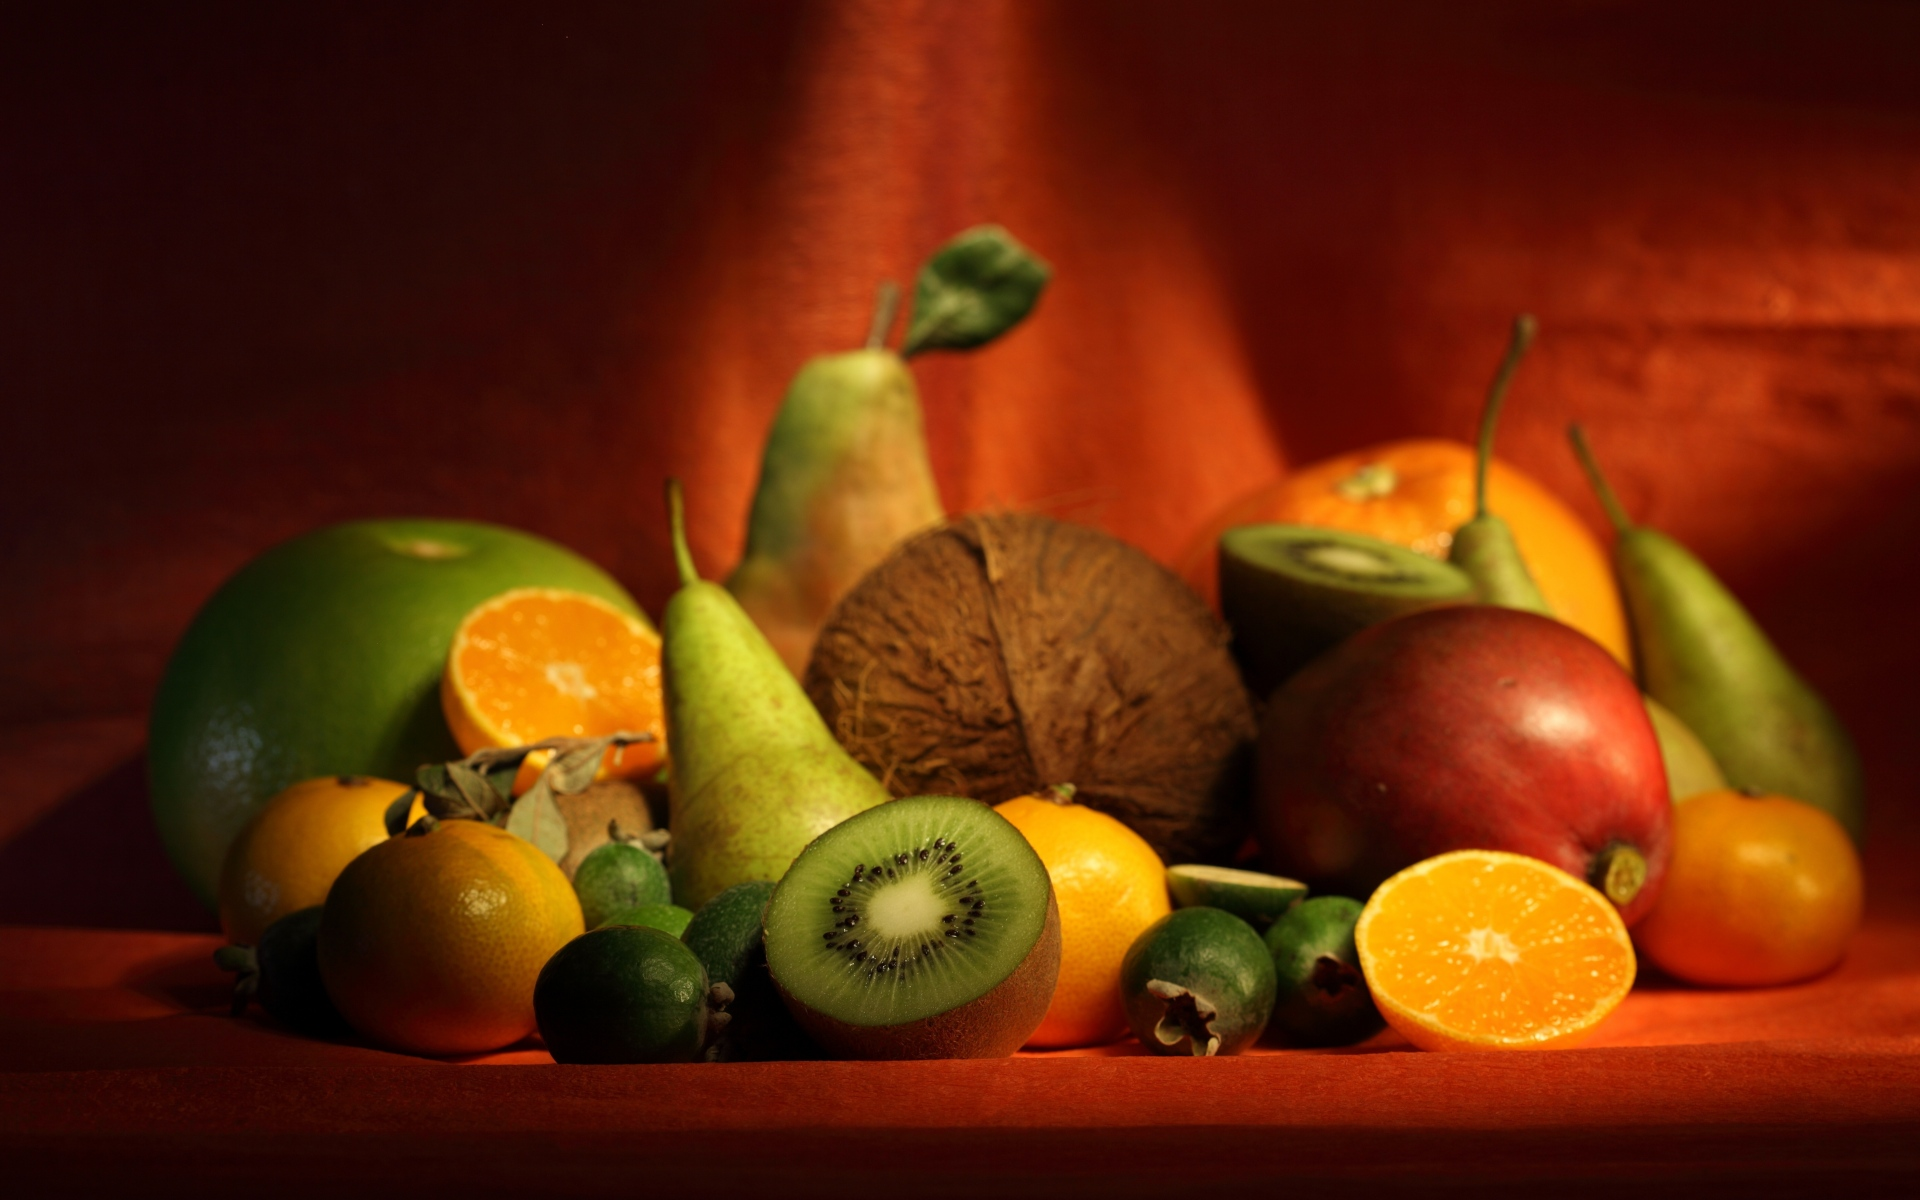 Картинки ягоды, бананы, фрукты, аппетит фото и обои на рабочий стол